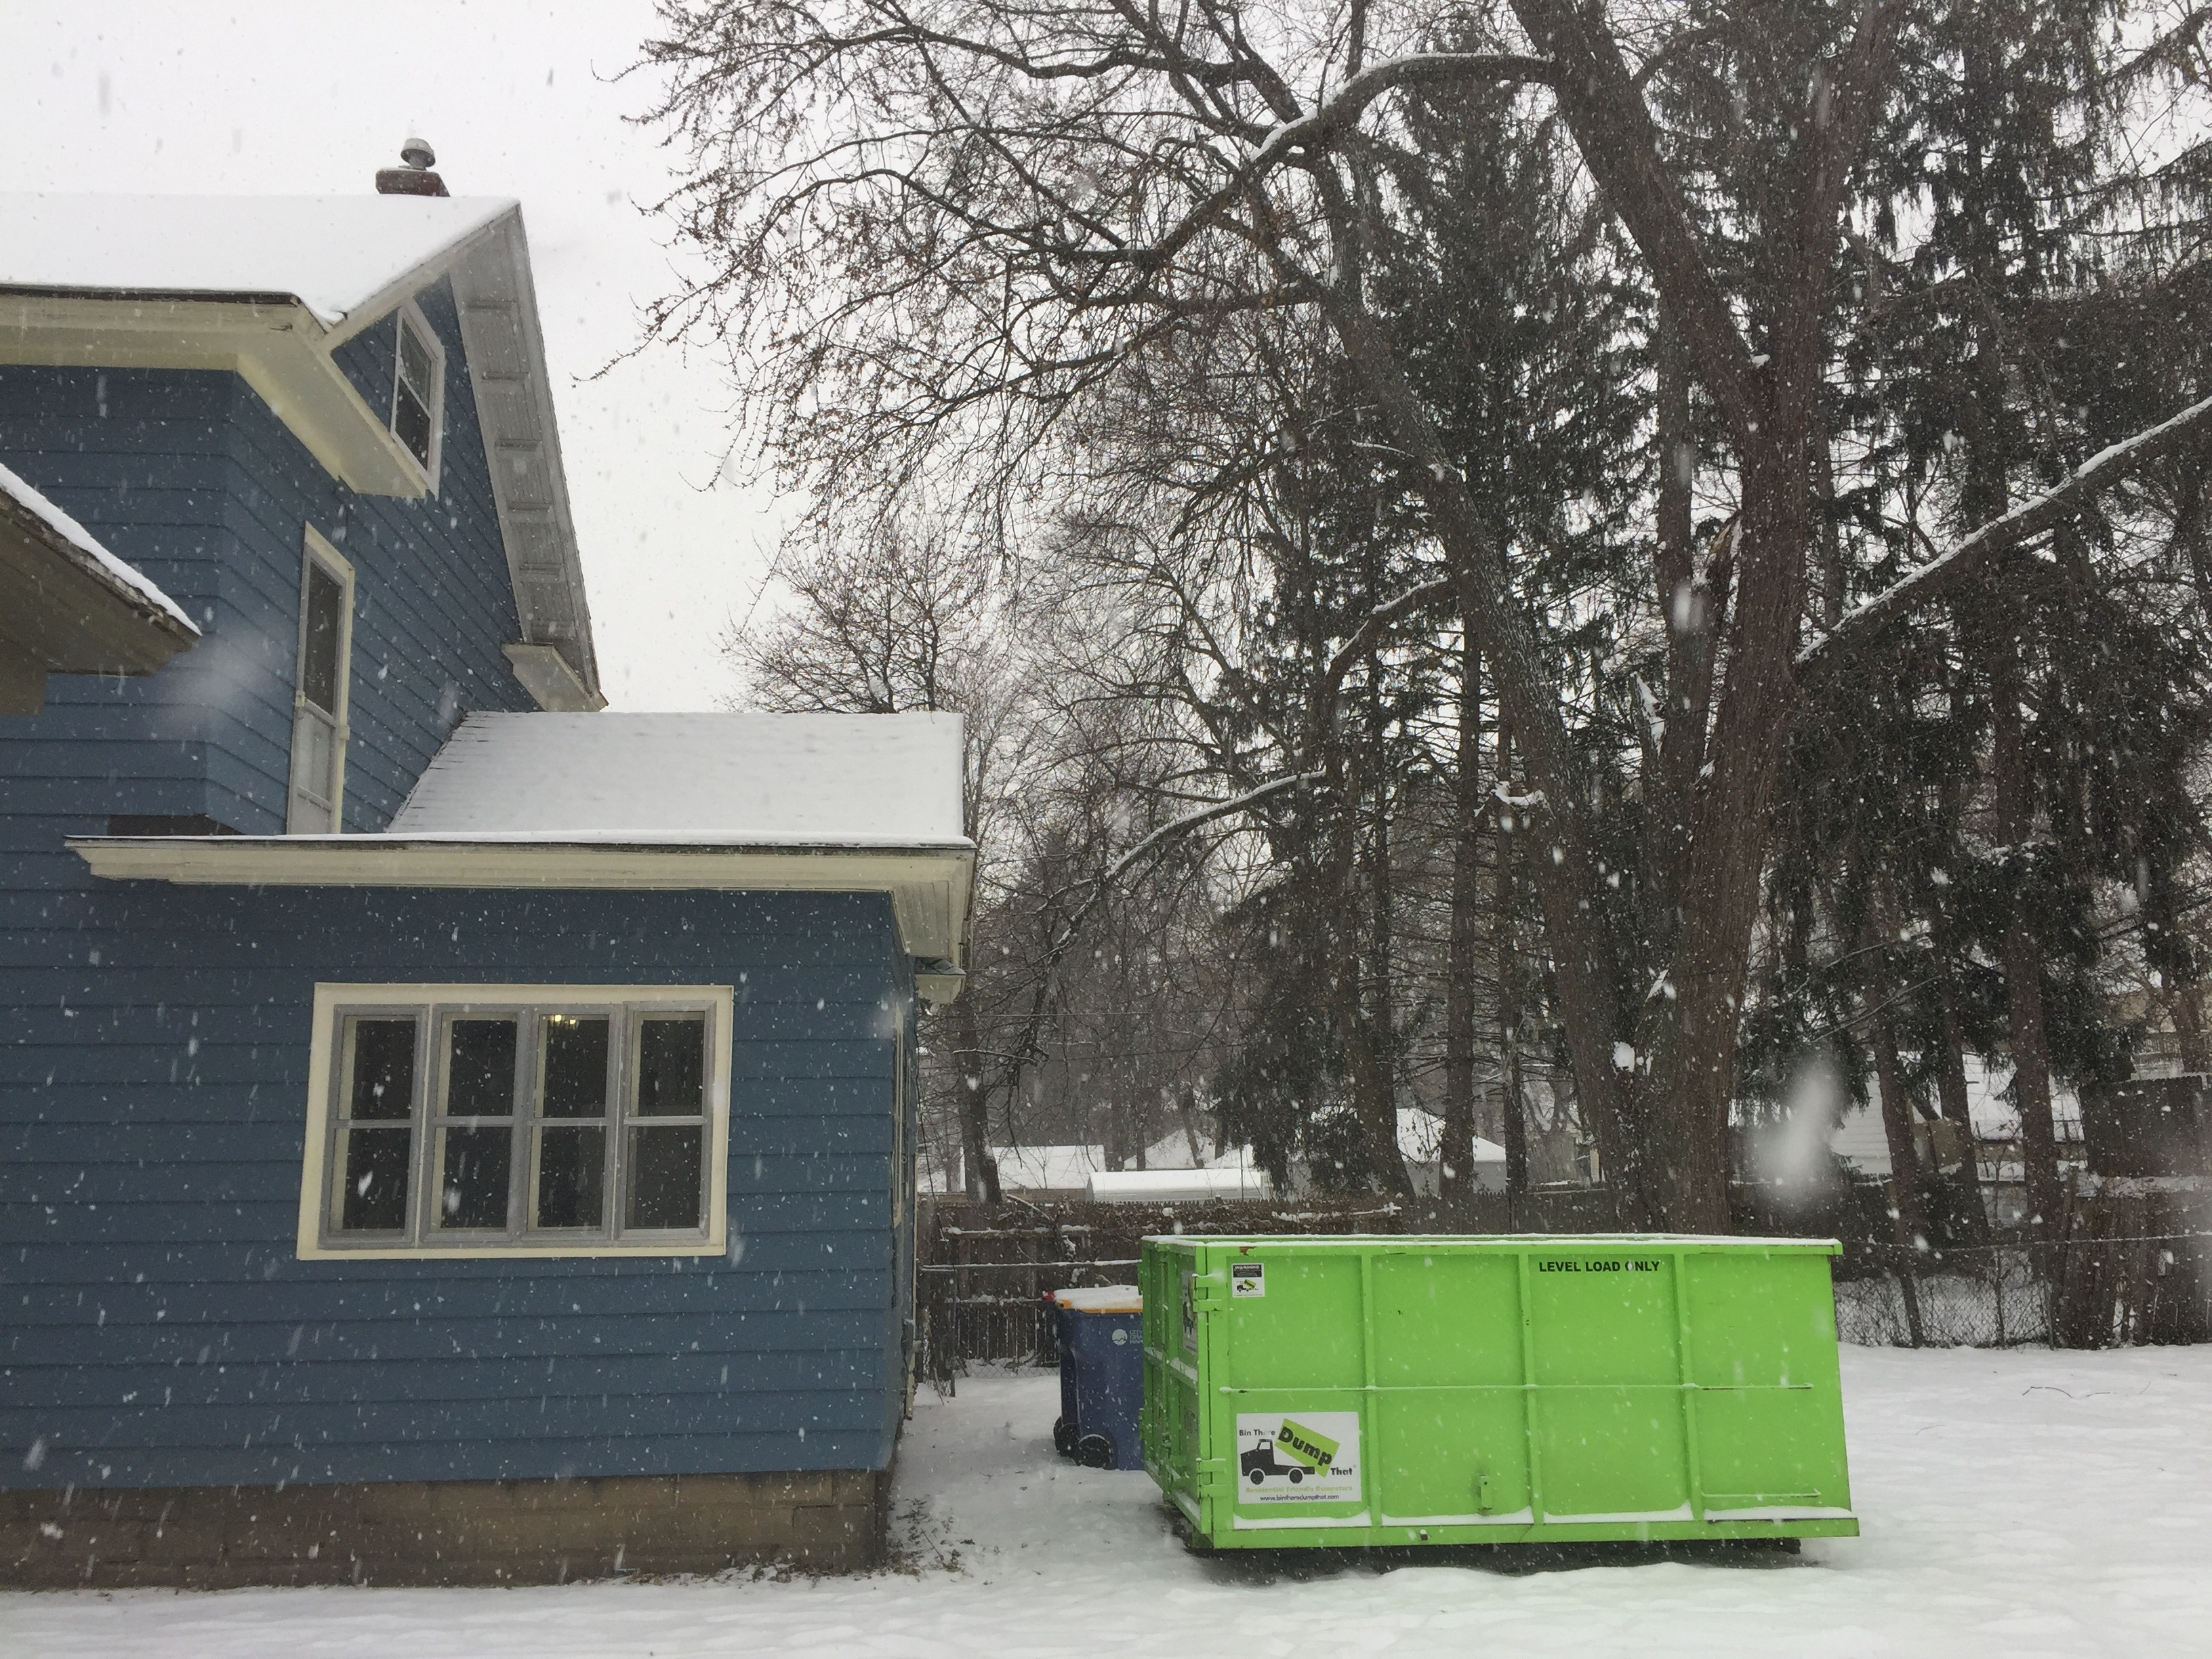 Dumpster Rental Tight Against House